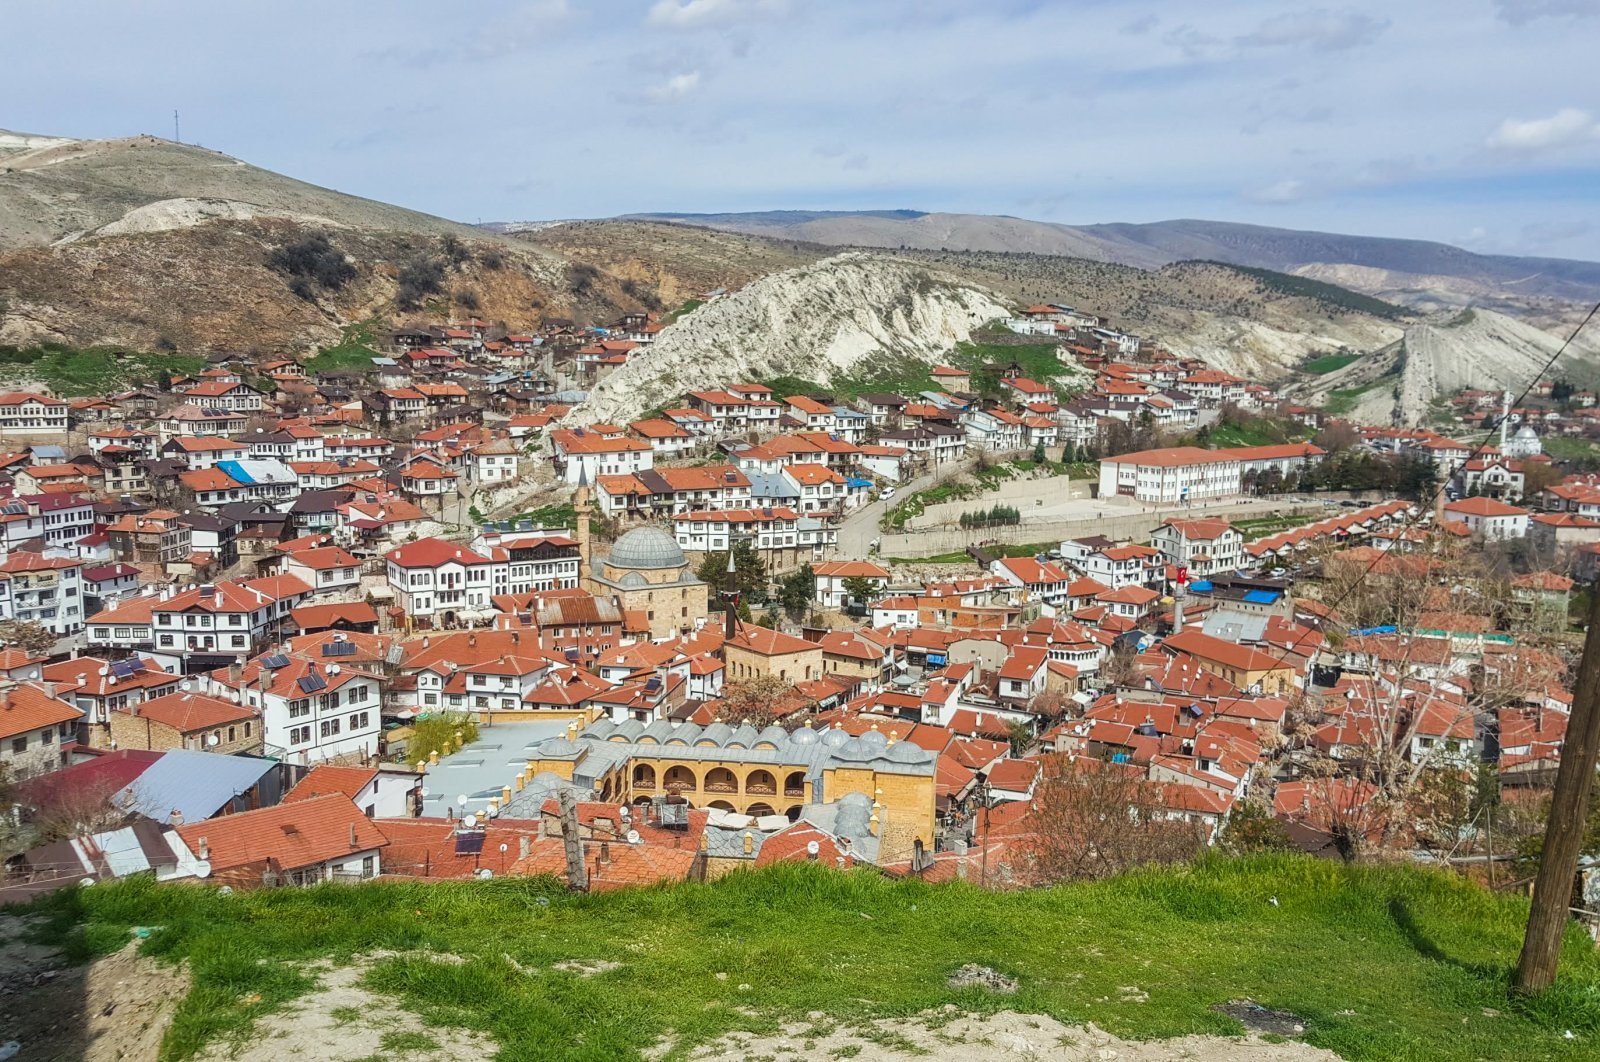 A general view of Beypazarı and its houses. (Photo by Argun Konuk)